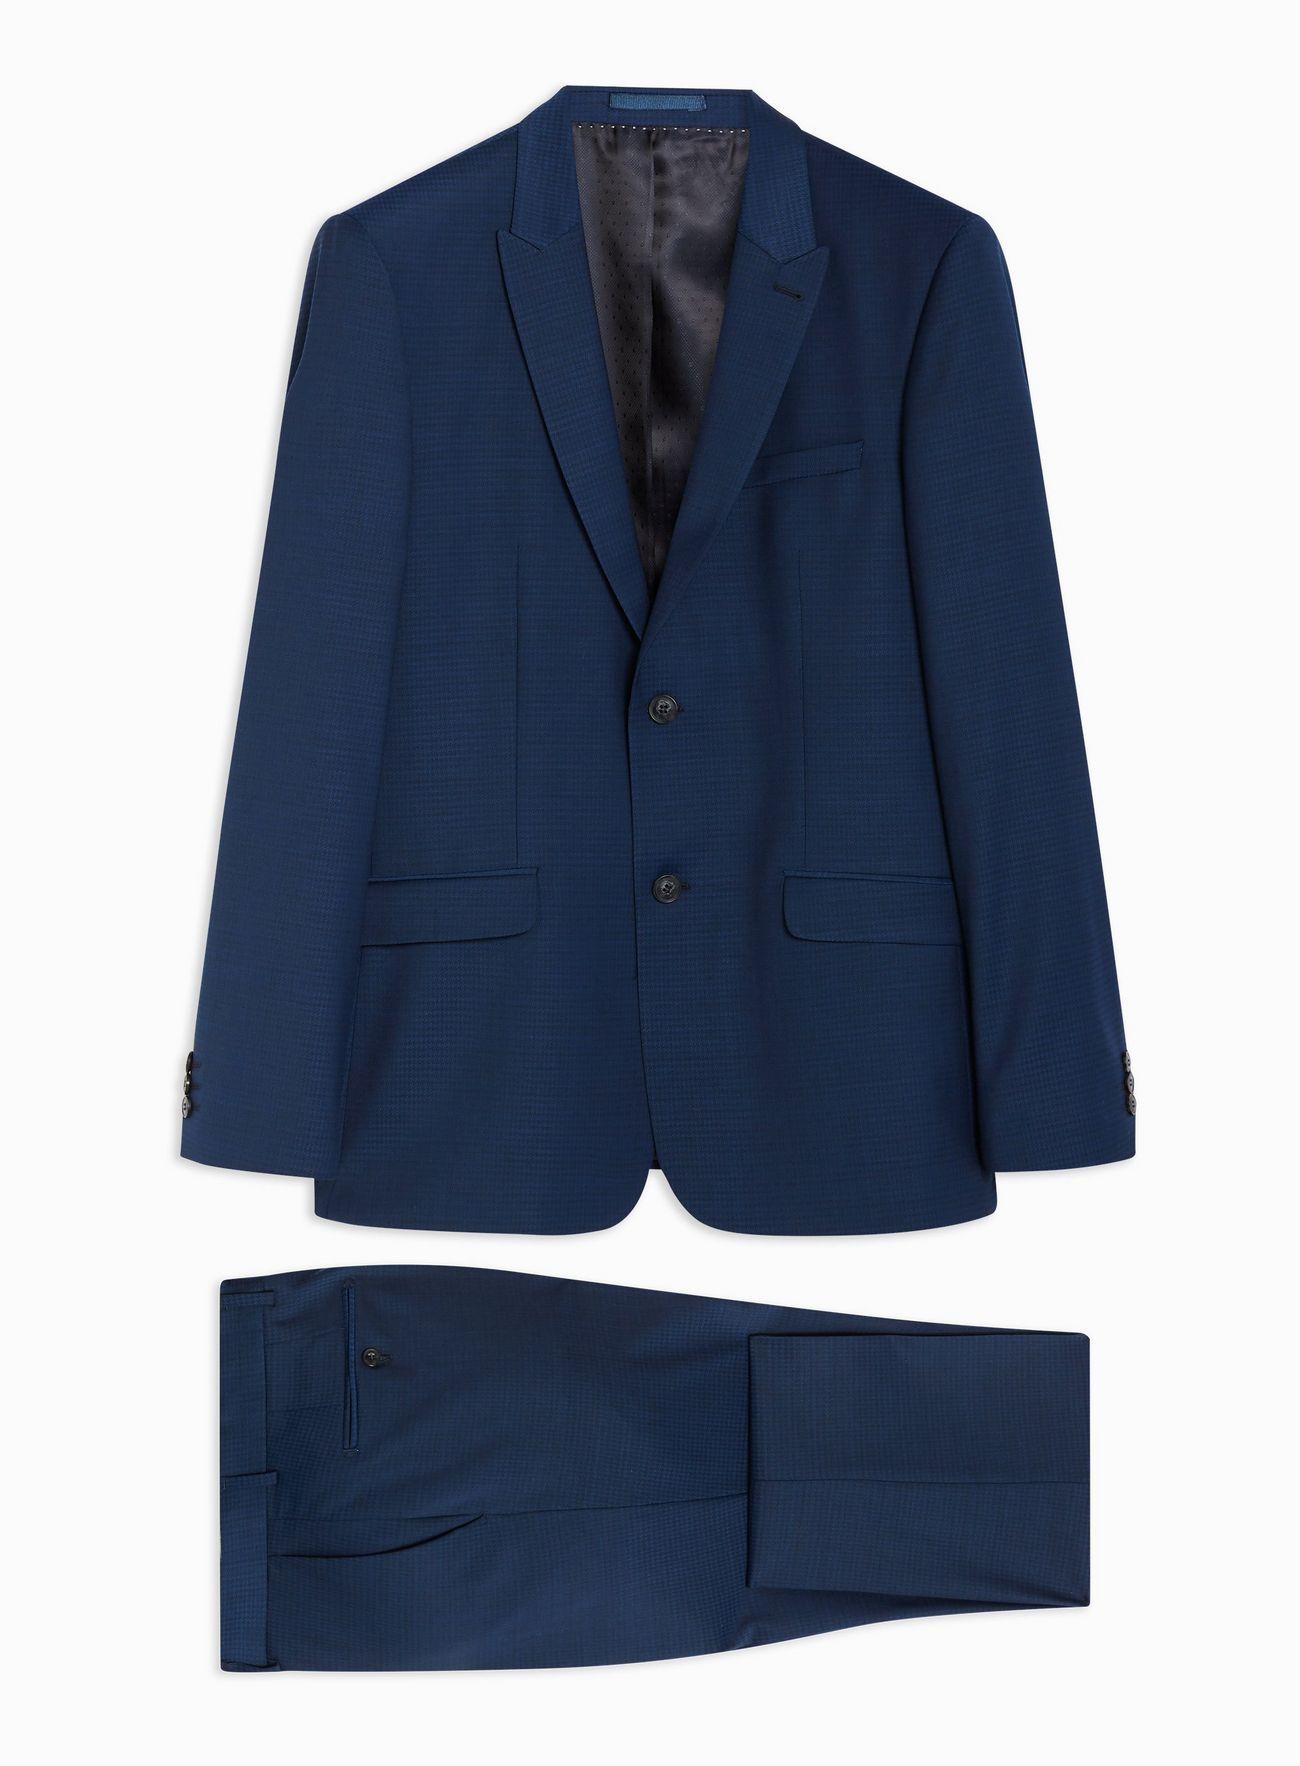 Premium Navy Check Suit